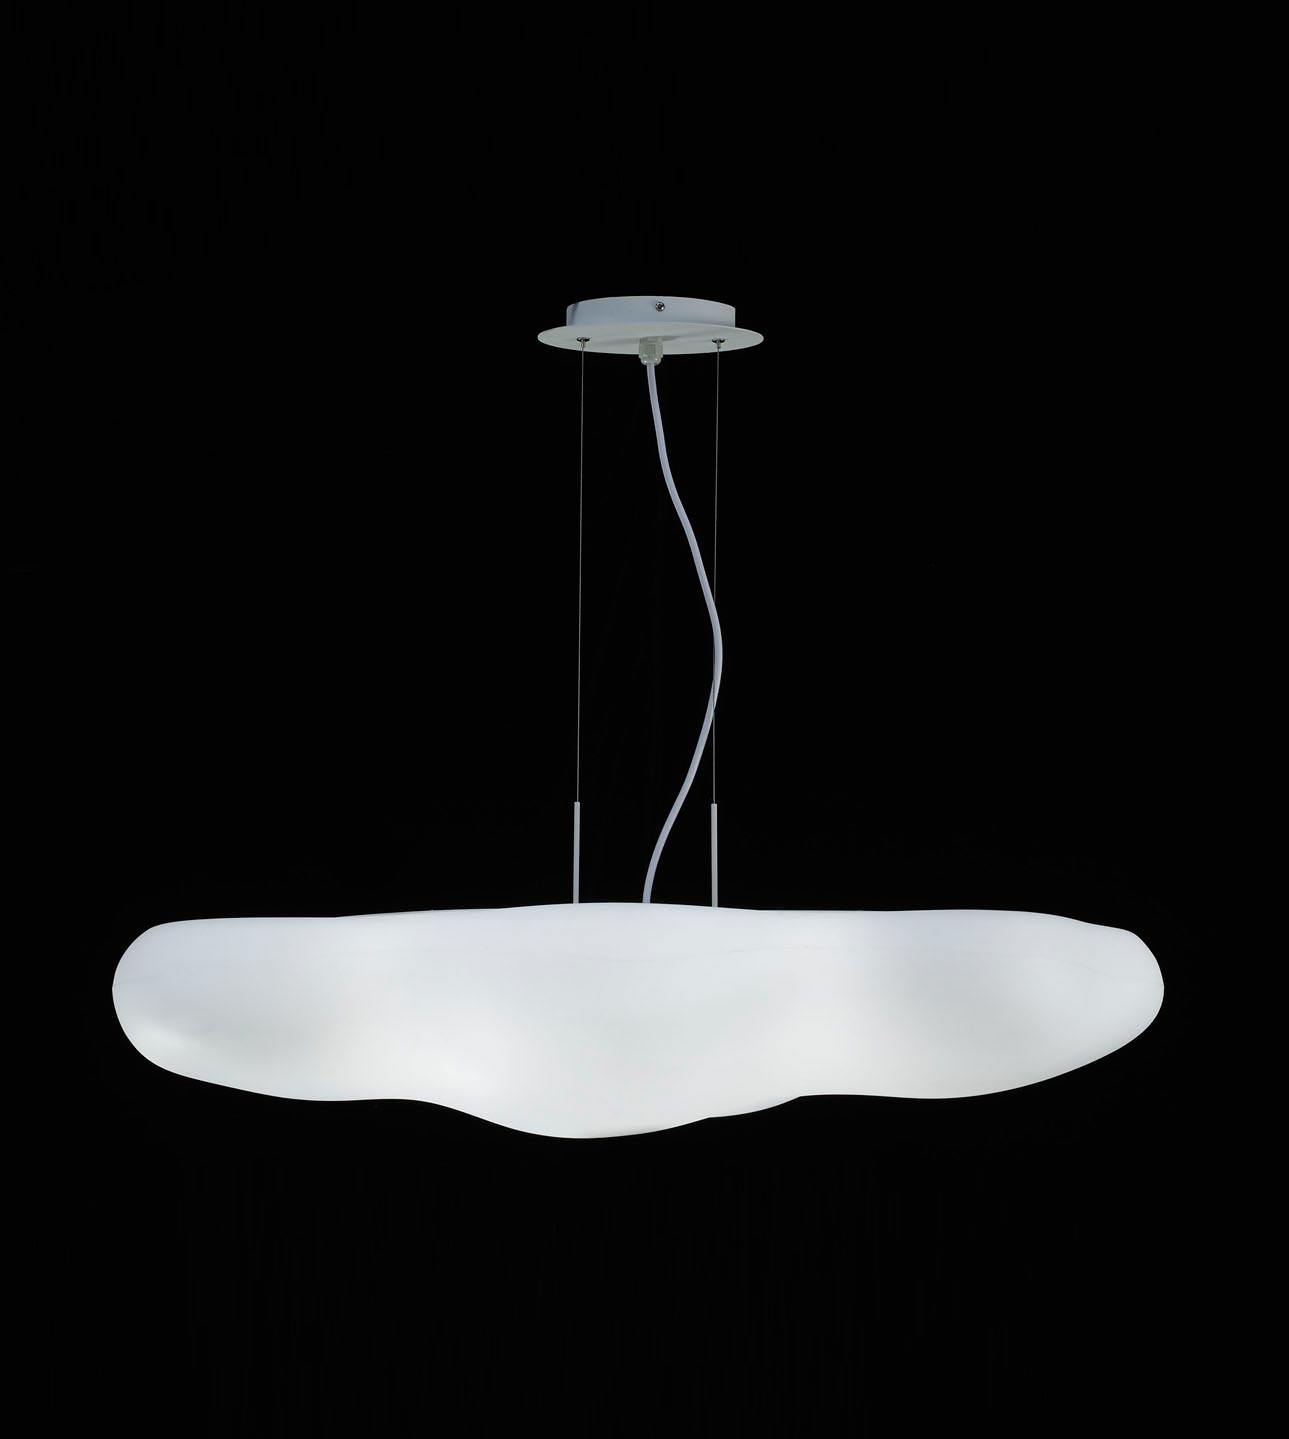 Lámpara colgante 6 luces EOS